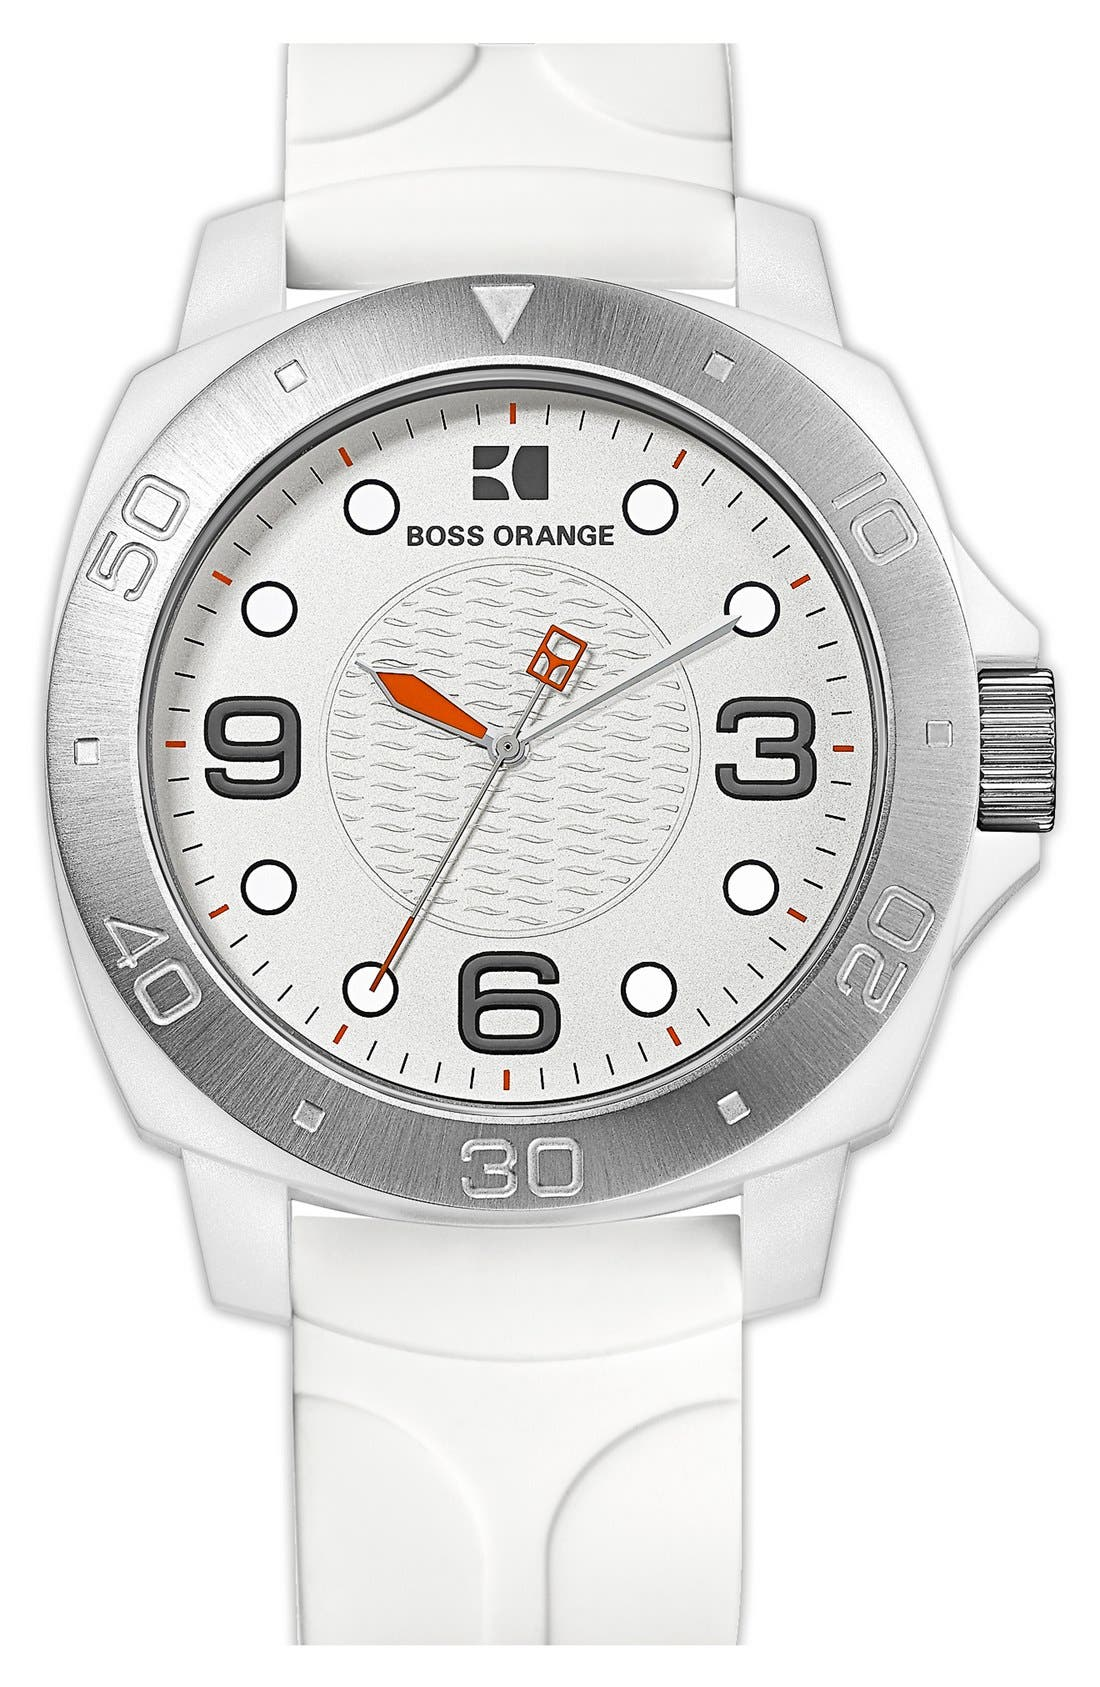 Main Image - BOSS Orange Round Silicone Strap Watch, 49mm